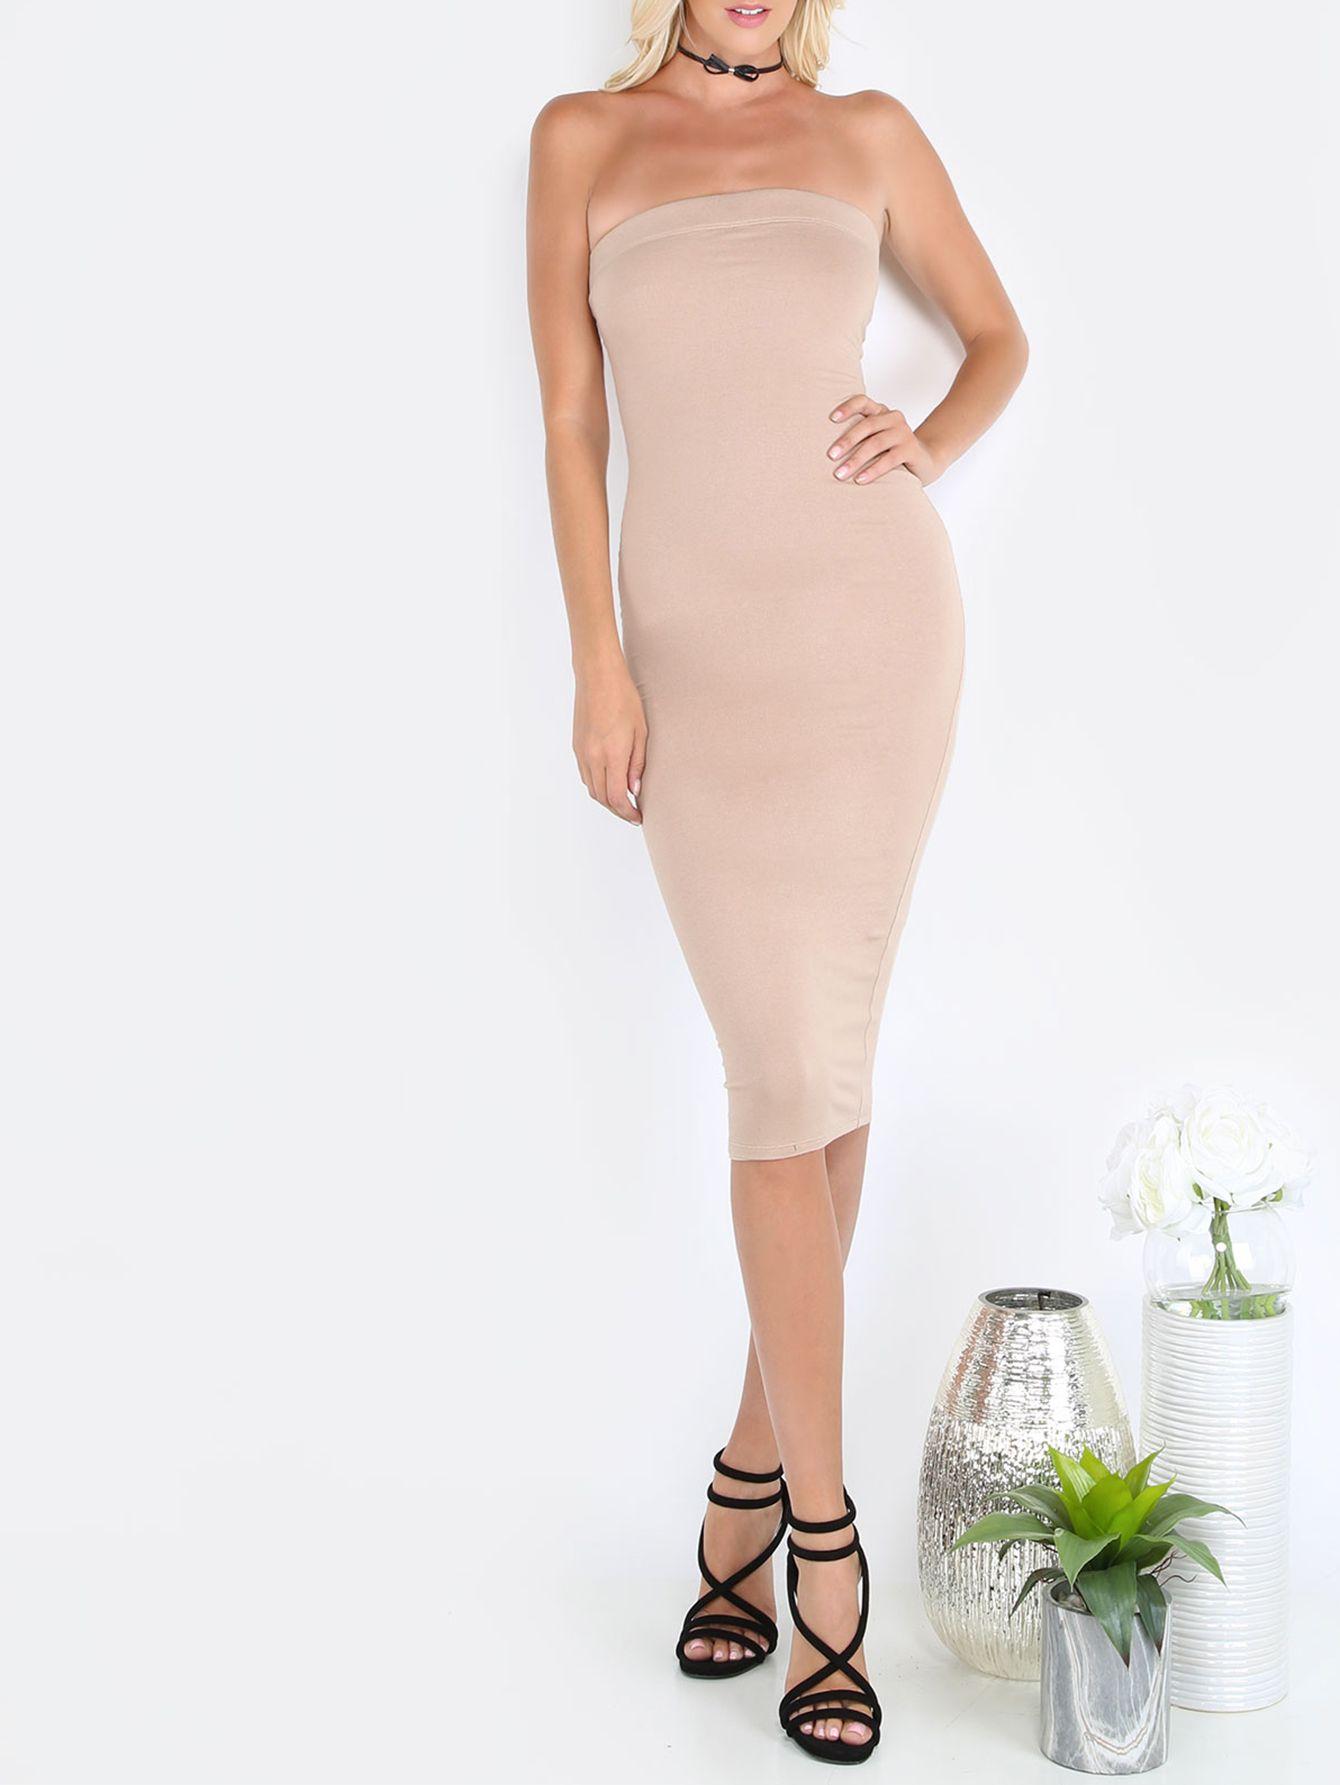 1a621d0af2 Dark Nude Tube Sleeveless Sheath Midi Dress -Nude Elegant Rayon Strapless  Sleeveless Sheath Midi Plain